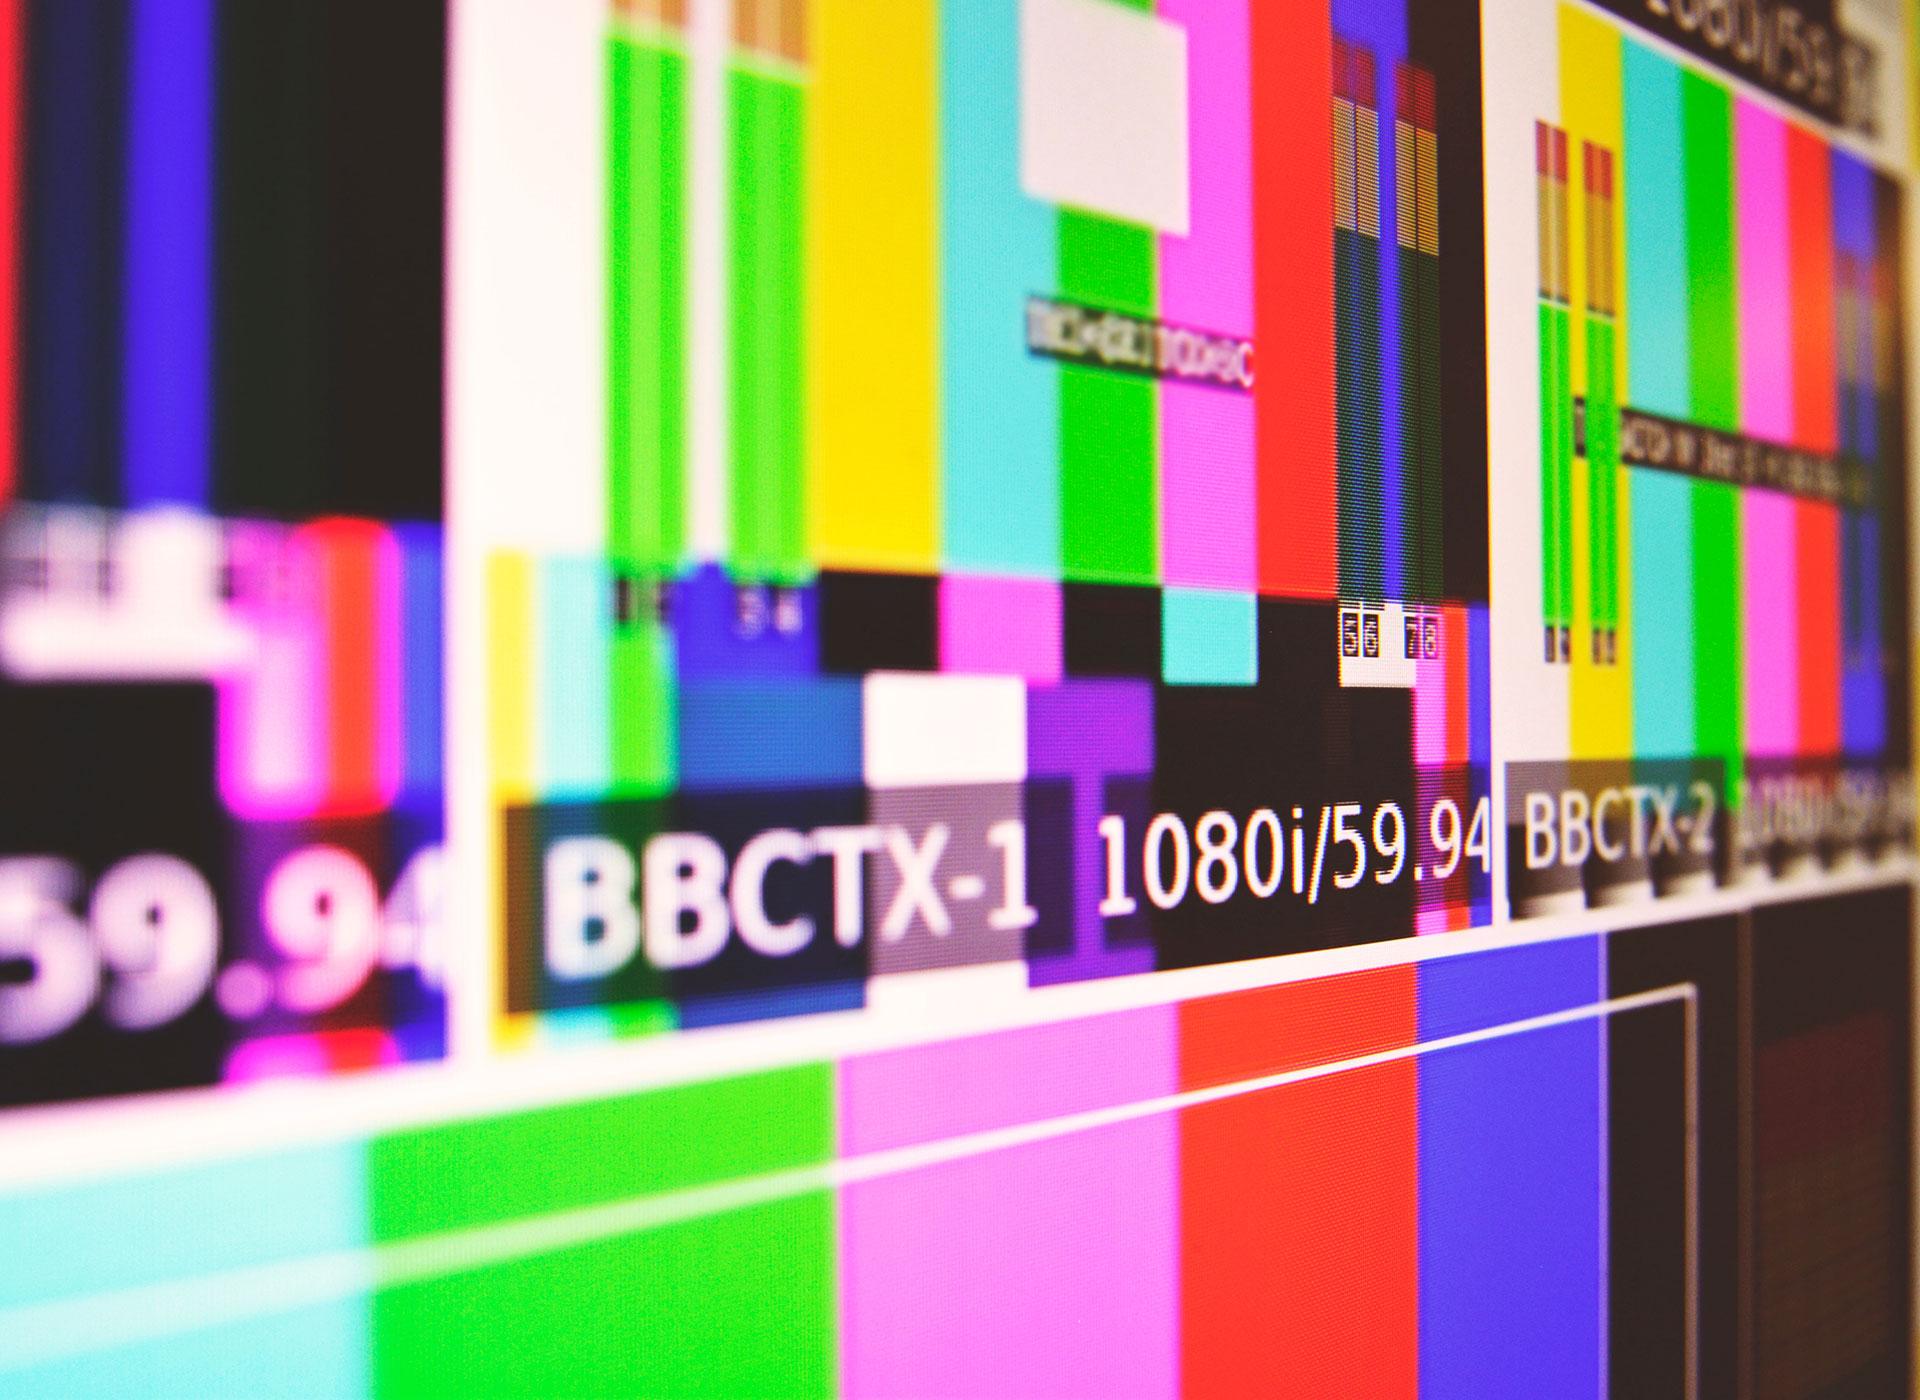 Pimloc raises £1.4m to bring data privacy to video